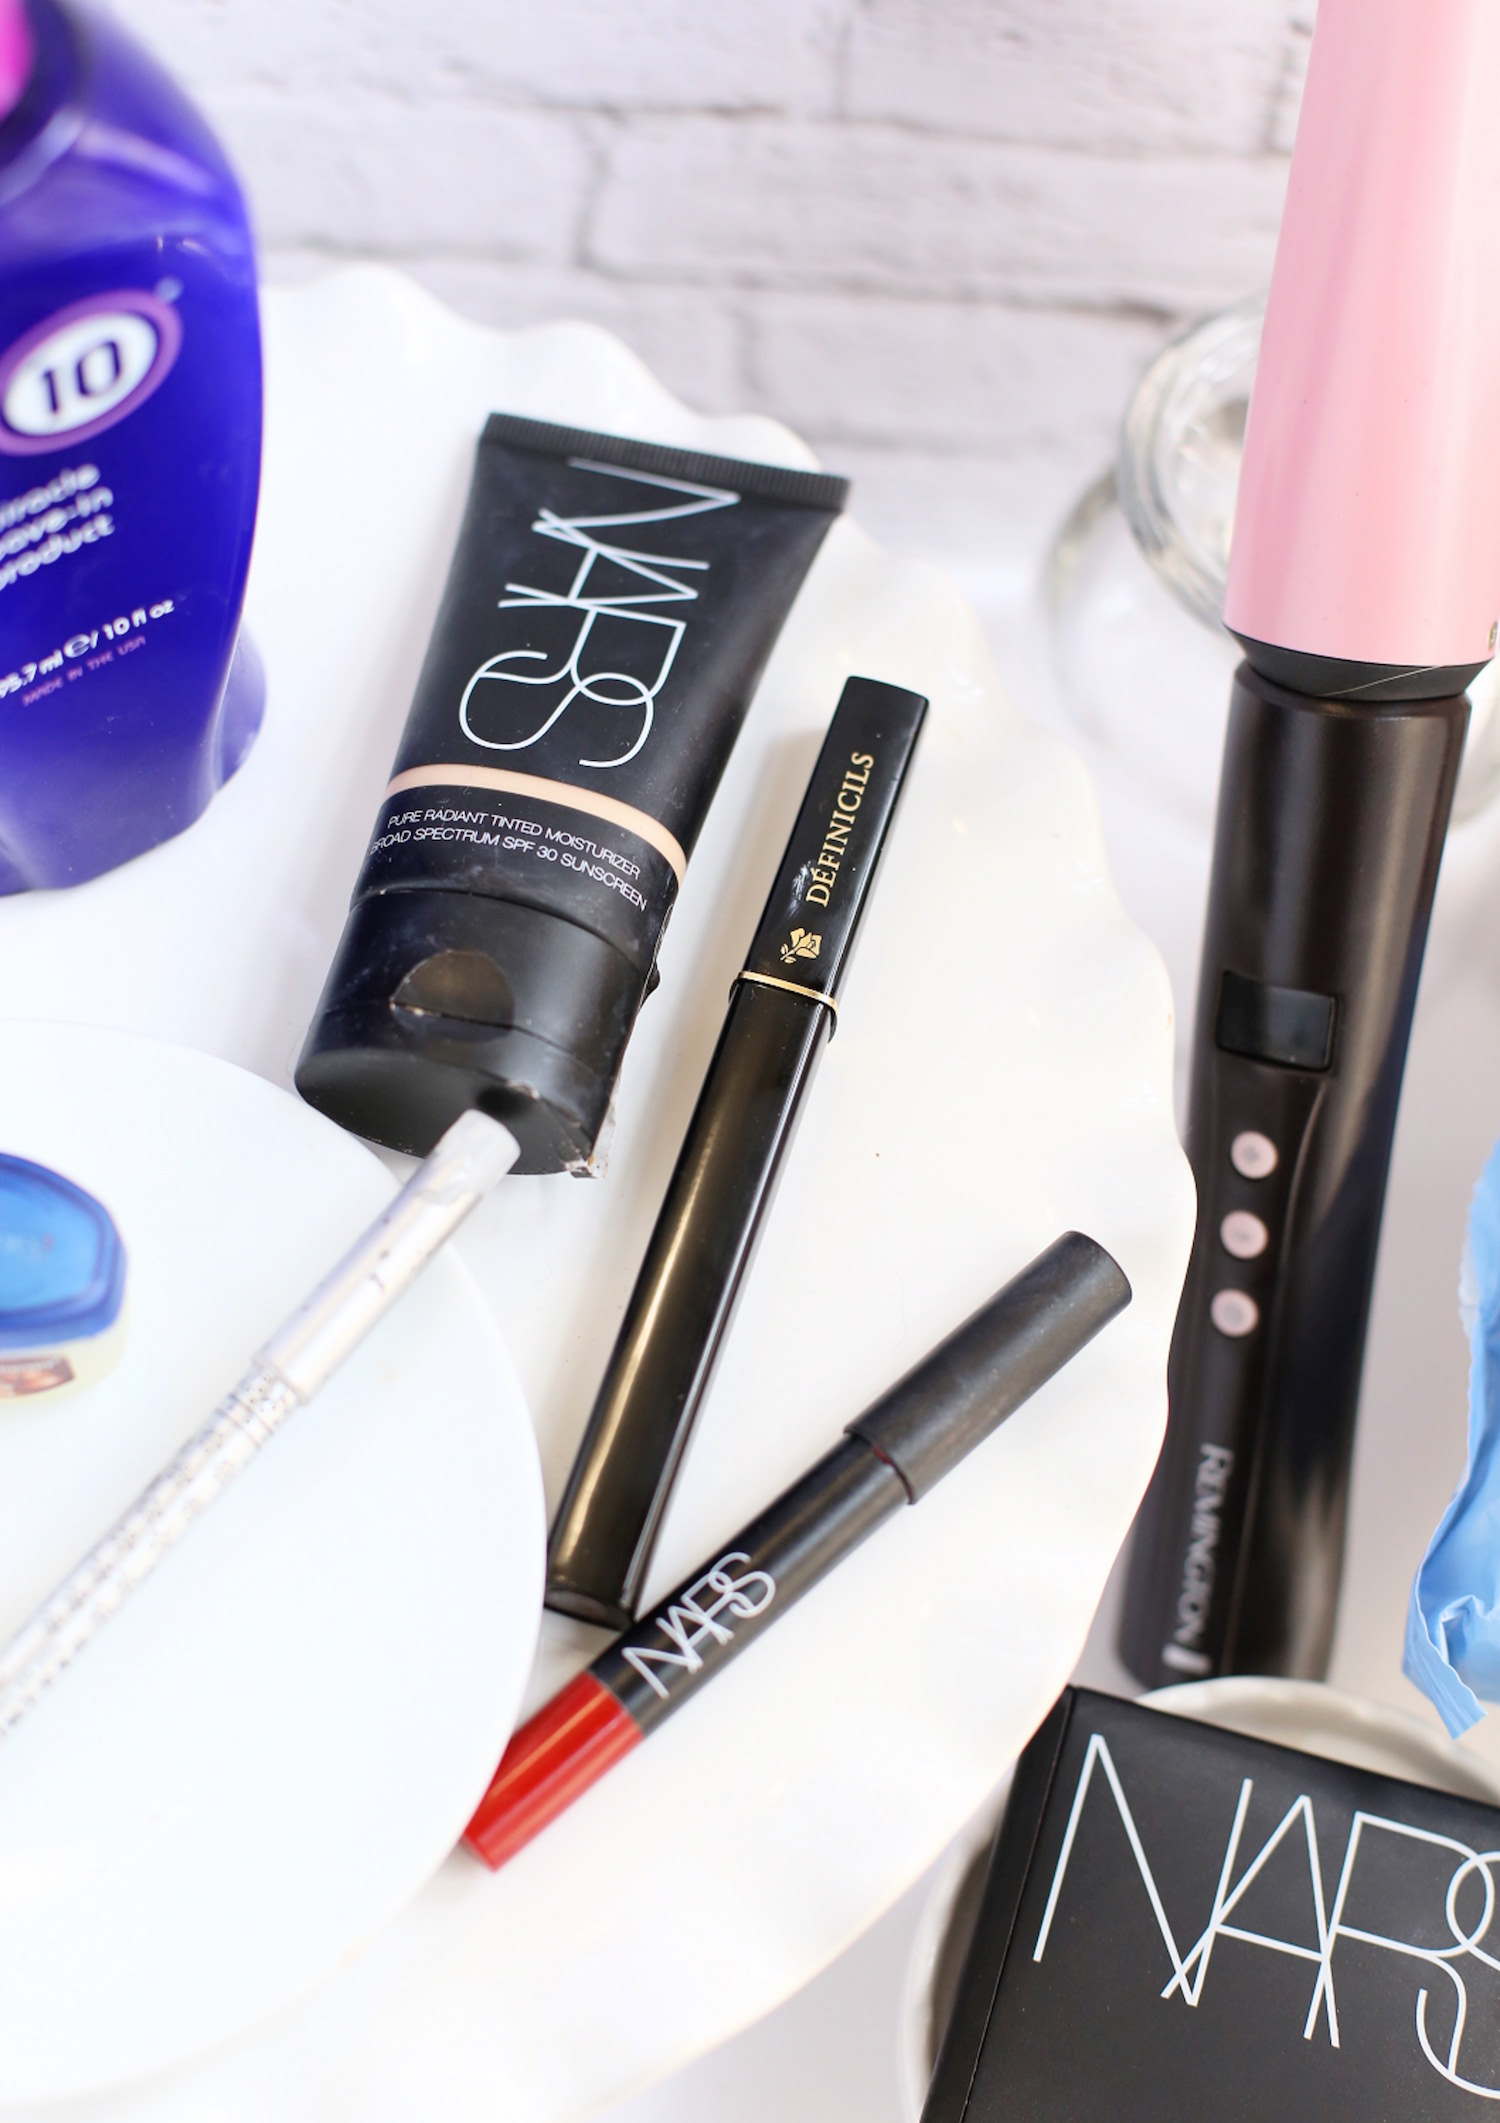 My 10 New Favorite Beauty Products | TrufflesandTrends.com